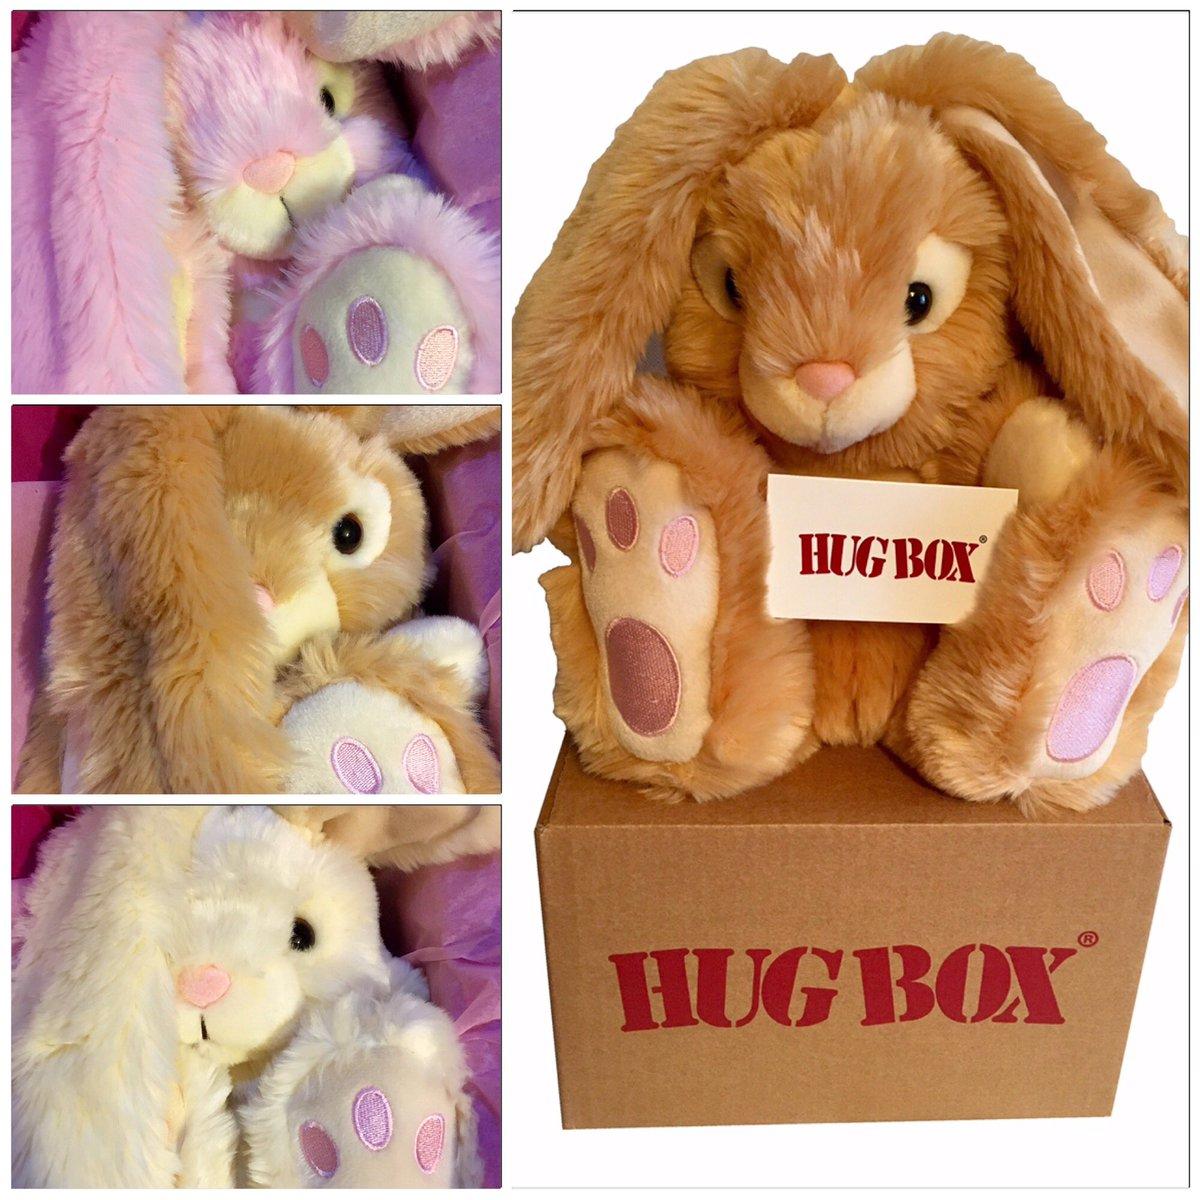 Huggable RABBIT HUG BOX  http://www. hugbox.co.uk/buy-a-hug-box/ http-www-hugbox-co-uk-buy-a-hug-box-personalised-gift-rabbit-hug-box-detail-html-detail.html &nbsp; …  #Personalised #Gift #Thanks #MissYou #ThinkingOfYou #Idea #Birthday #Exam #CheerUp #Smile <br>http://pic.twitter.com/FANMG59aQk